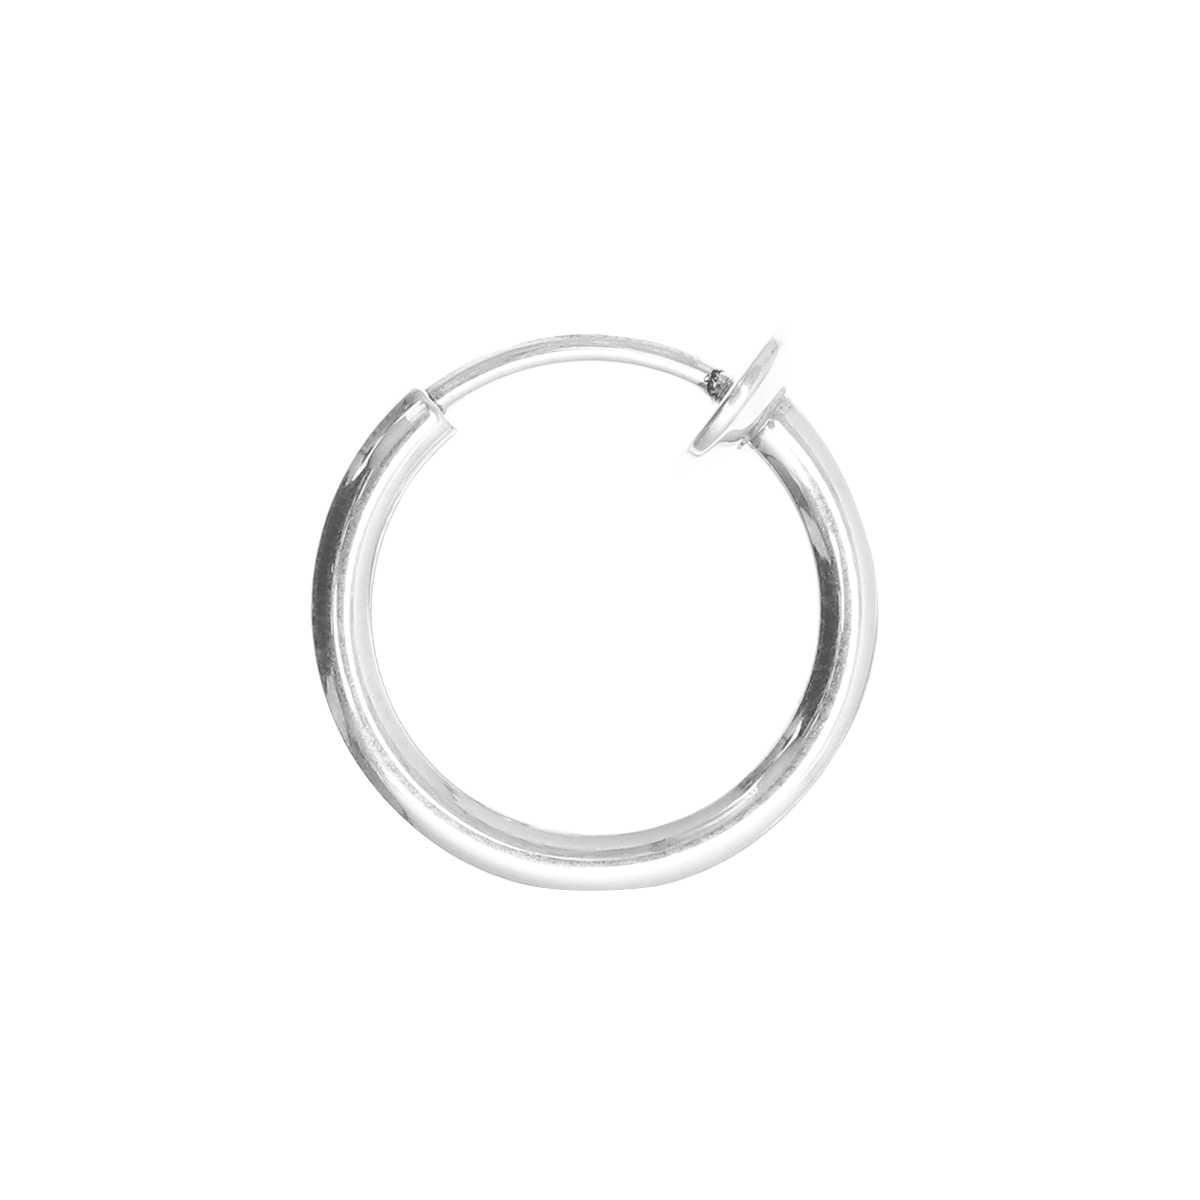 1pc Mens עגילי טבעת נייל נירוסטה קליפ-על סגירת עגילי האף שפתיים בטן גבות Helix סחוס Tragus עגילי חישוק